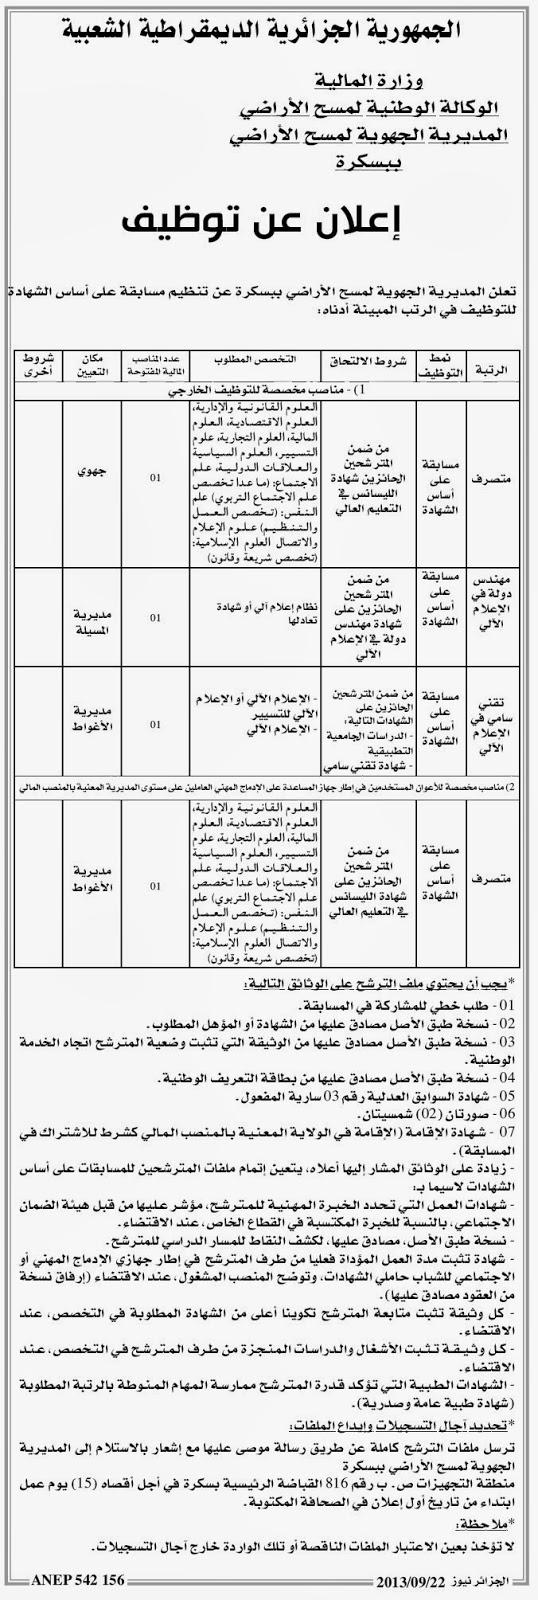 Les concours de la fonction publique en algerie 2013 - 2014 مسابقة توظيف بالمديرية الجهوية لمسح الاراضي ولاية بسكرة سبتمبر 2013 OA5bf